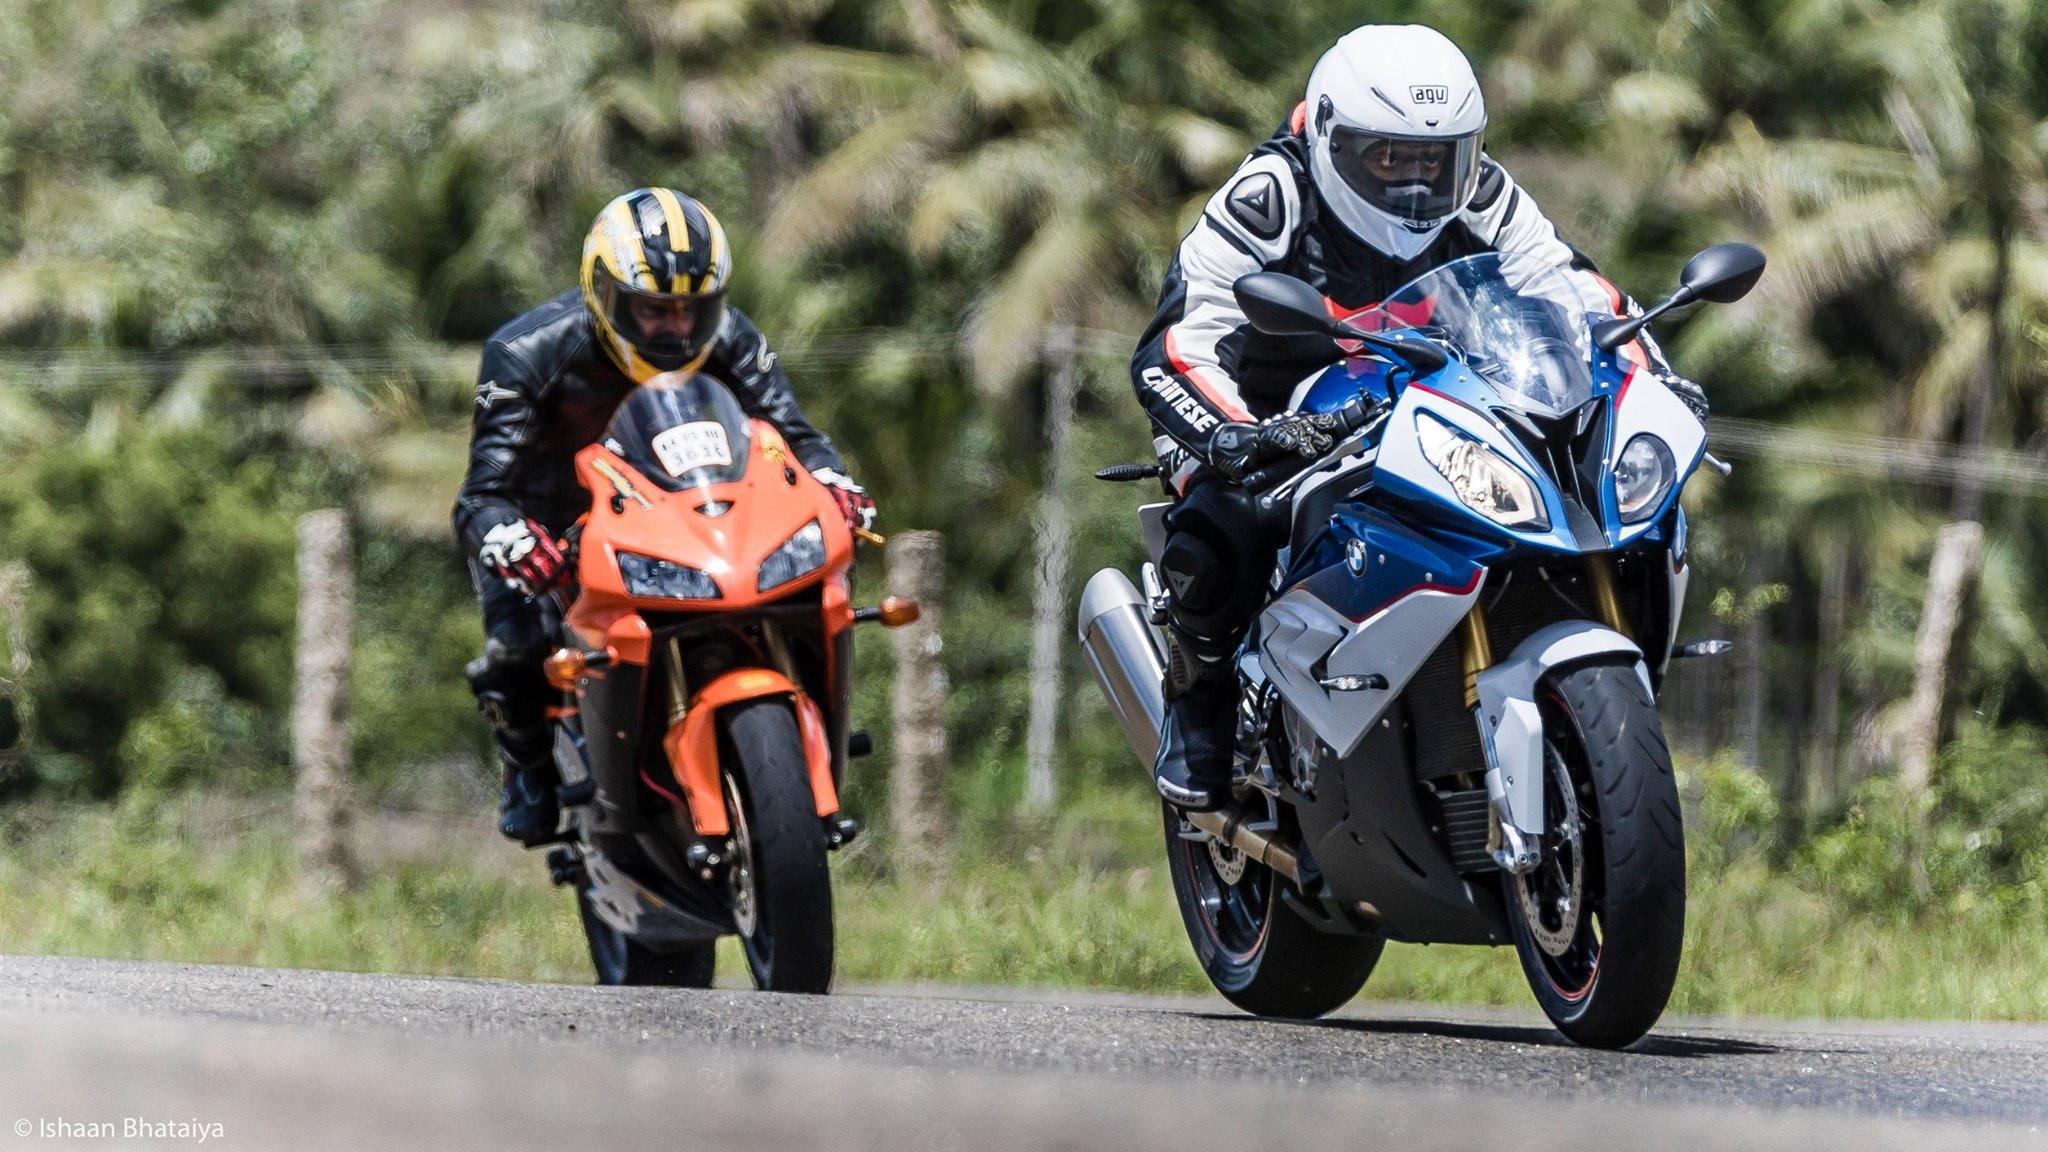 Indimotard - Motorcycle Tours, Riding School, Garage and Performance